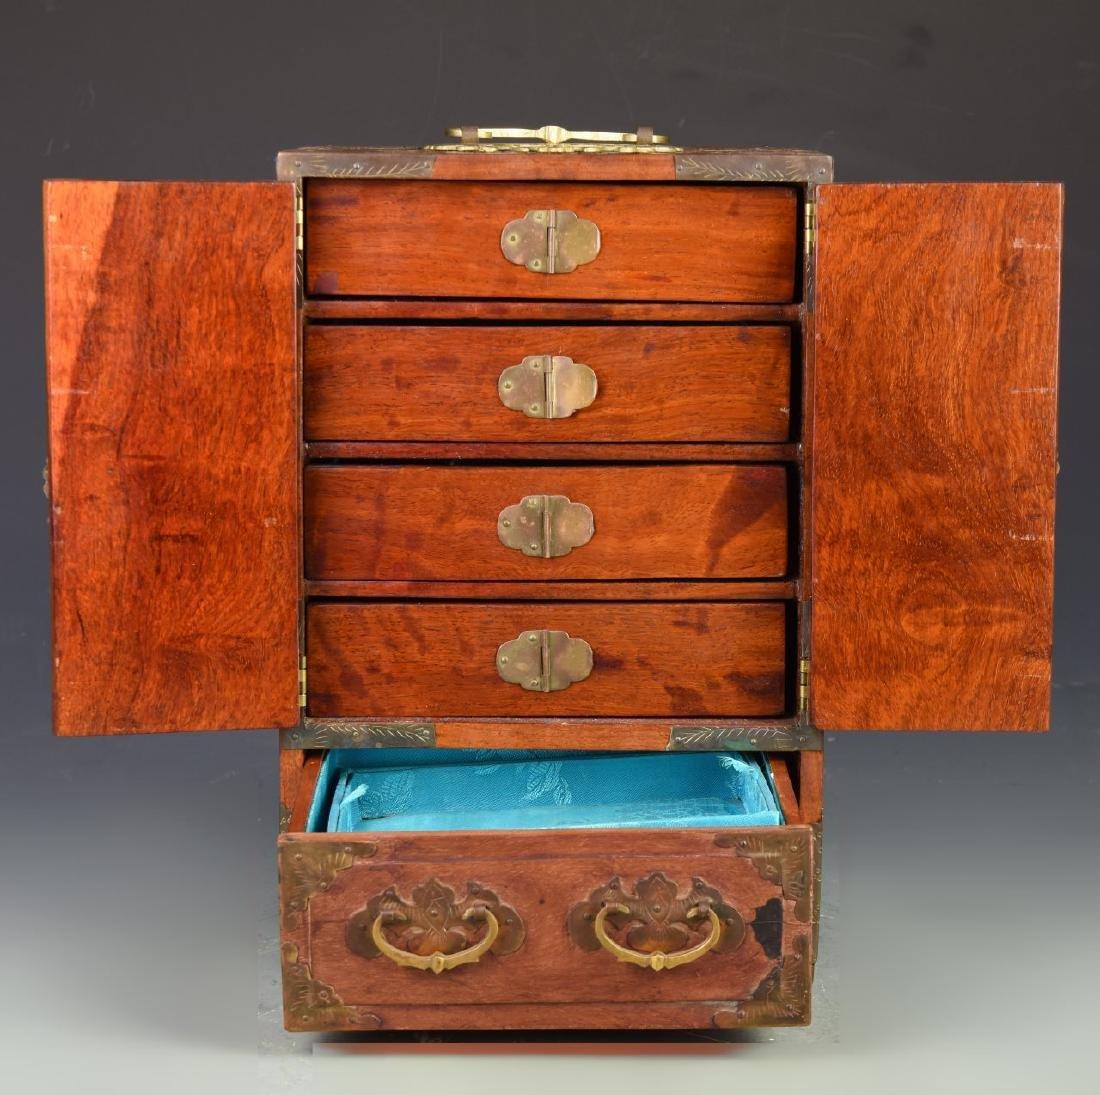 Chinese Vintage Jewelry Box - 4